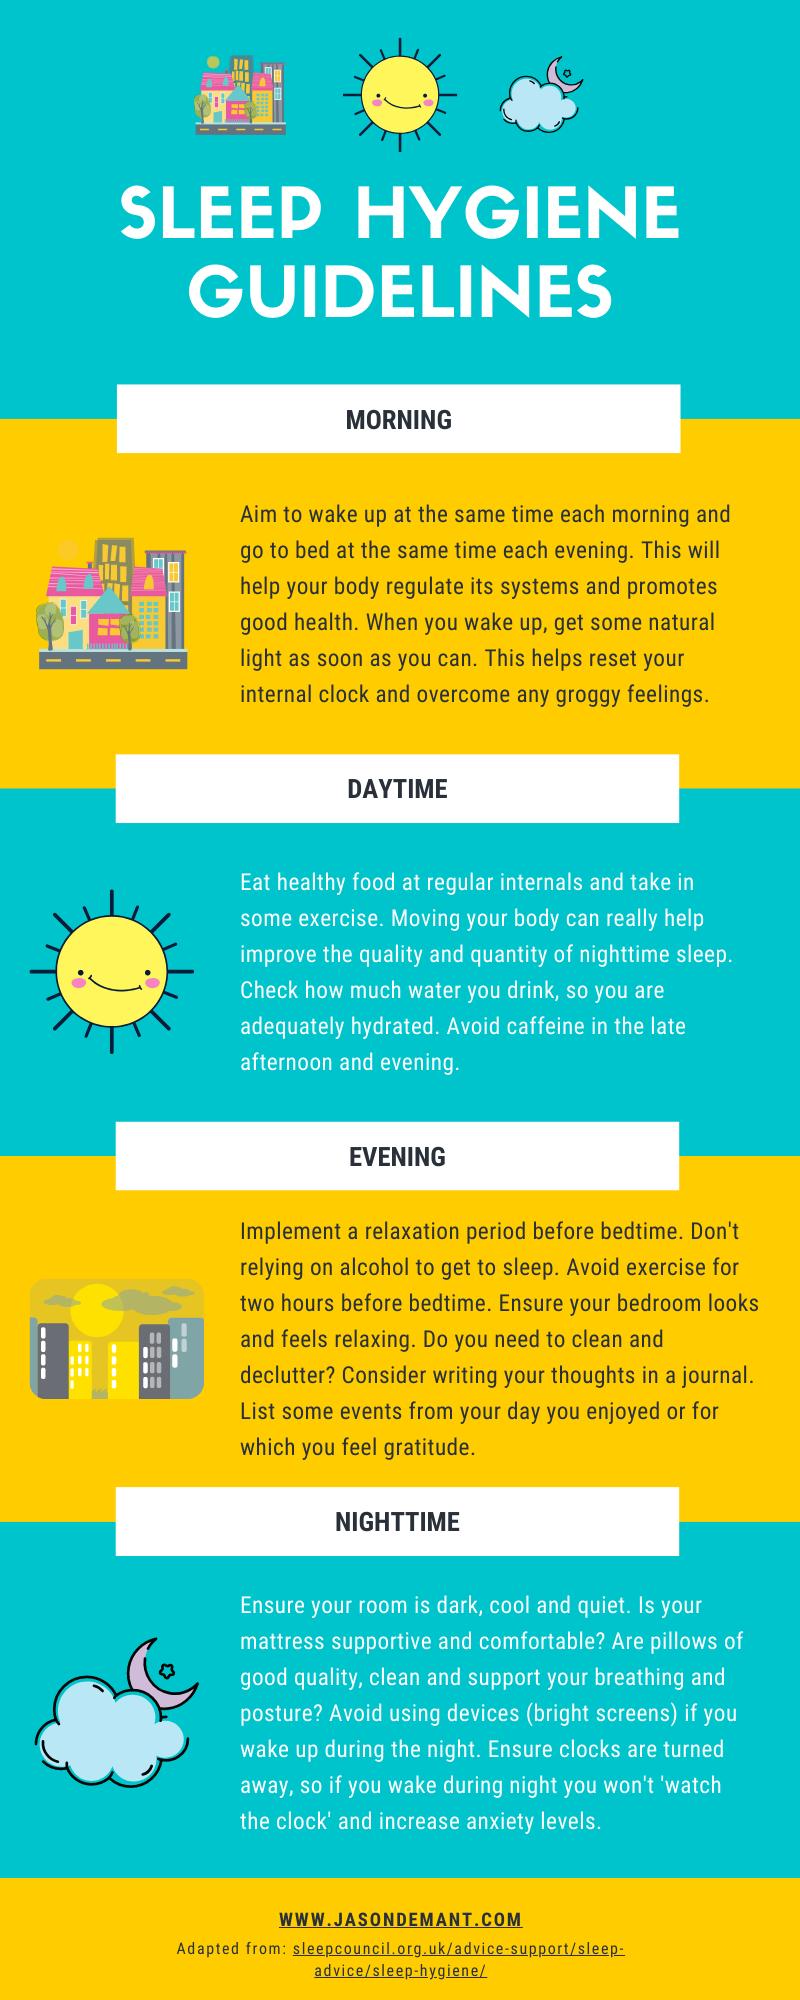 Sleep Hygiene Activities to Help You Sleep Soundly #infographic